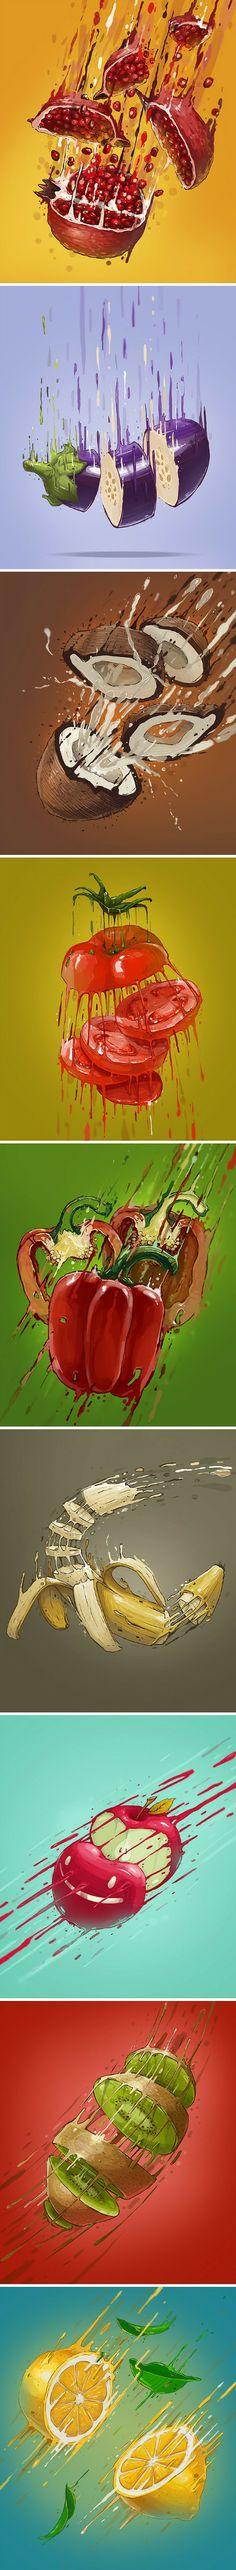 Vitamin Bomb is very interesting and inspirational project from Bulgarian Graffiti artist and illustrator Georgi Dimitrov